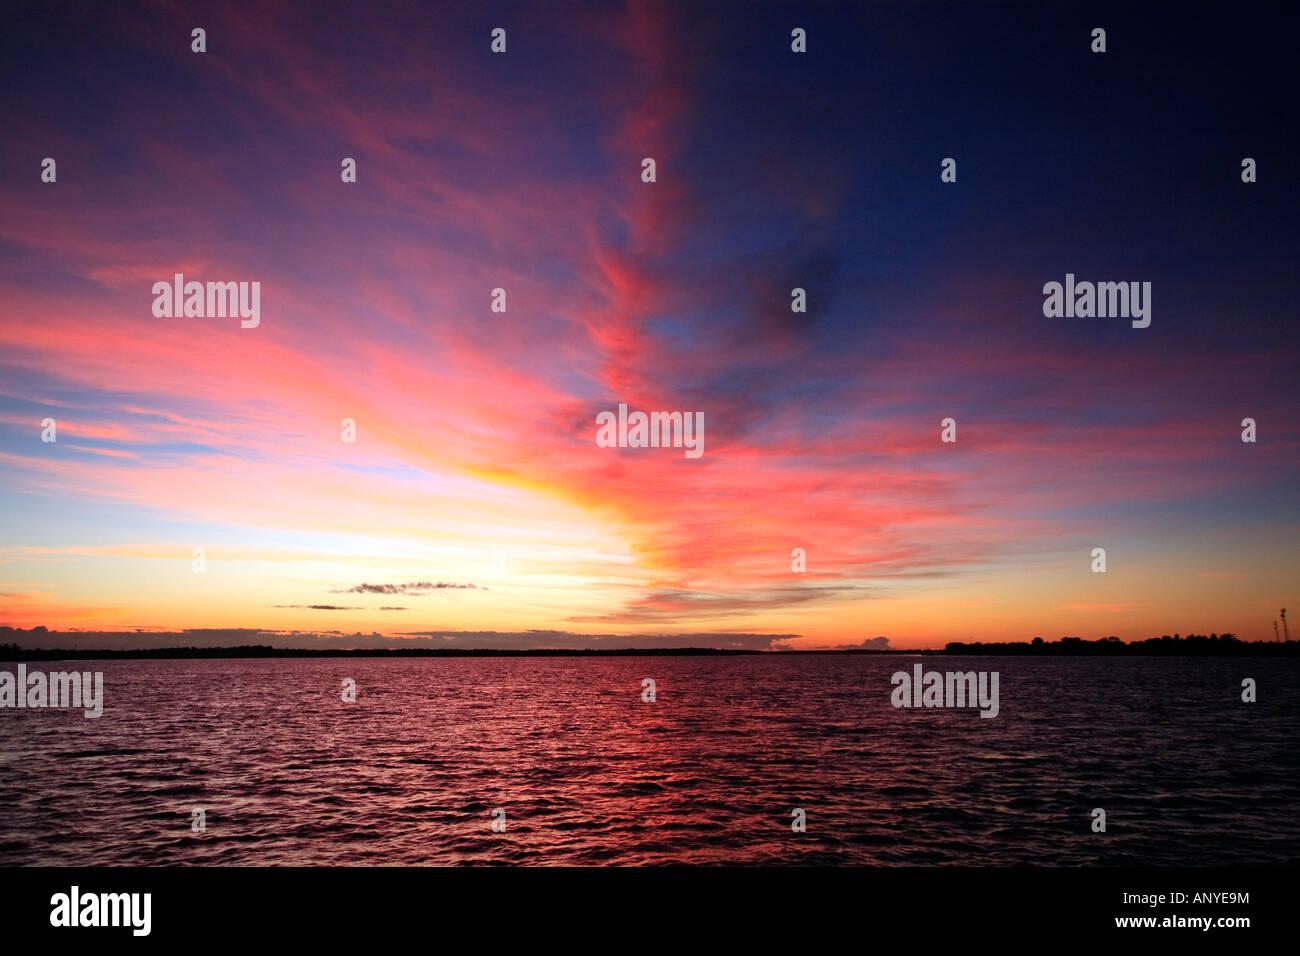 red sunset on caravelas bahia state brazil - Stock Image